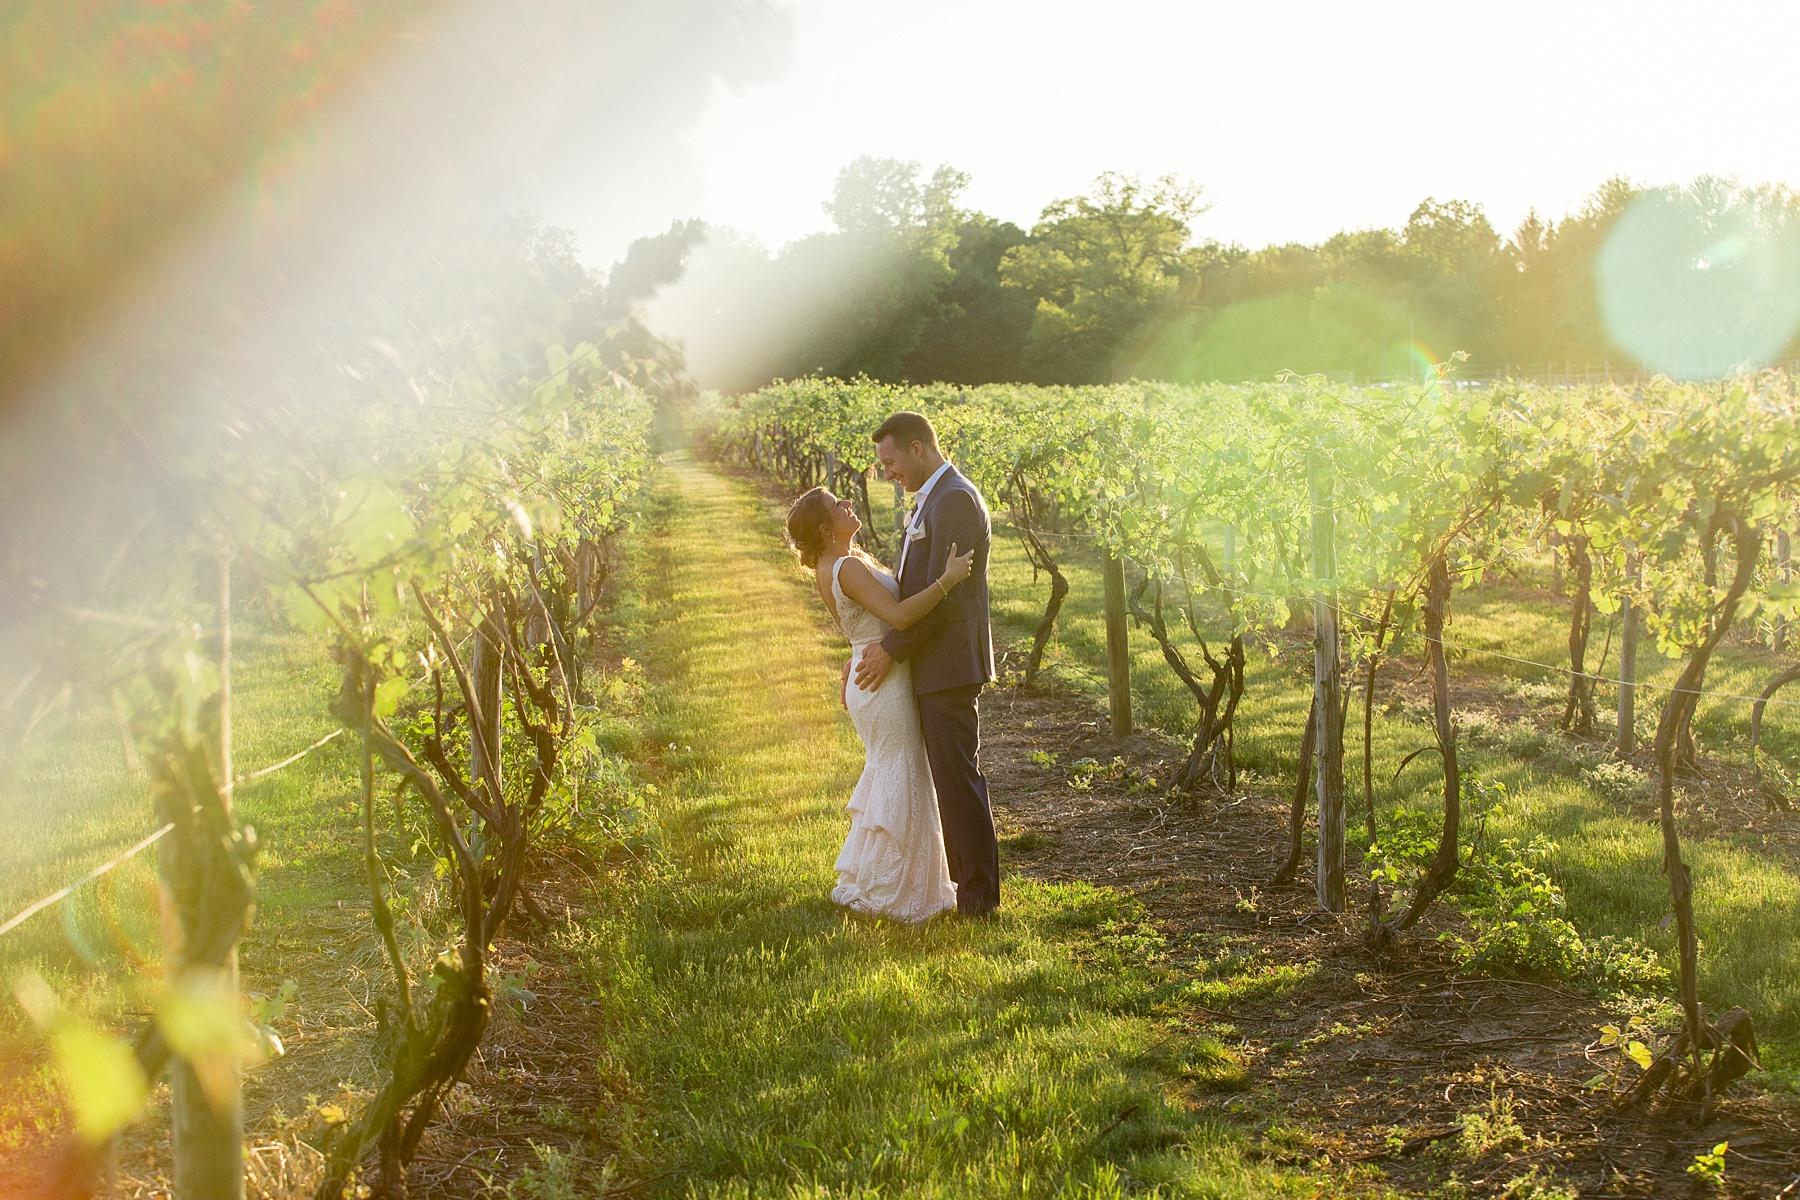 Brandon_Shafer_Photography_Kara_Doug_12_corners_Wedding_Benton_Harbor_0083.jpg